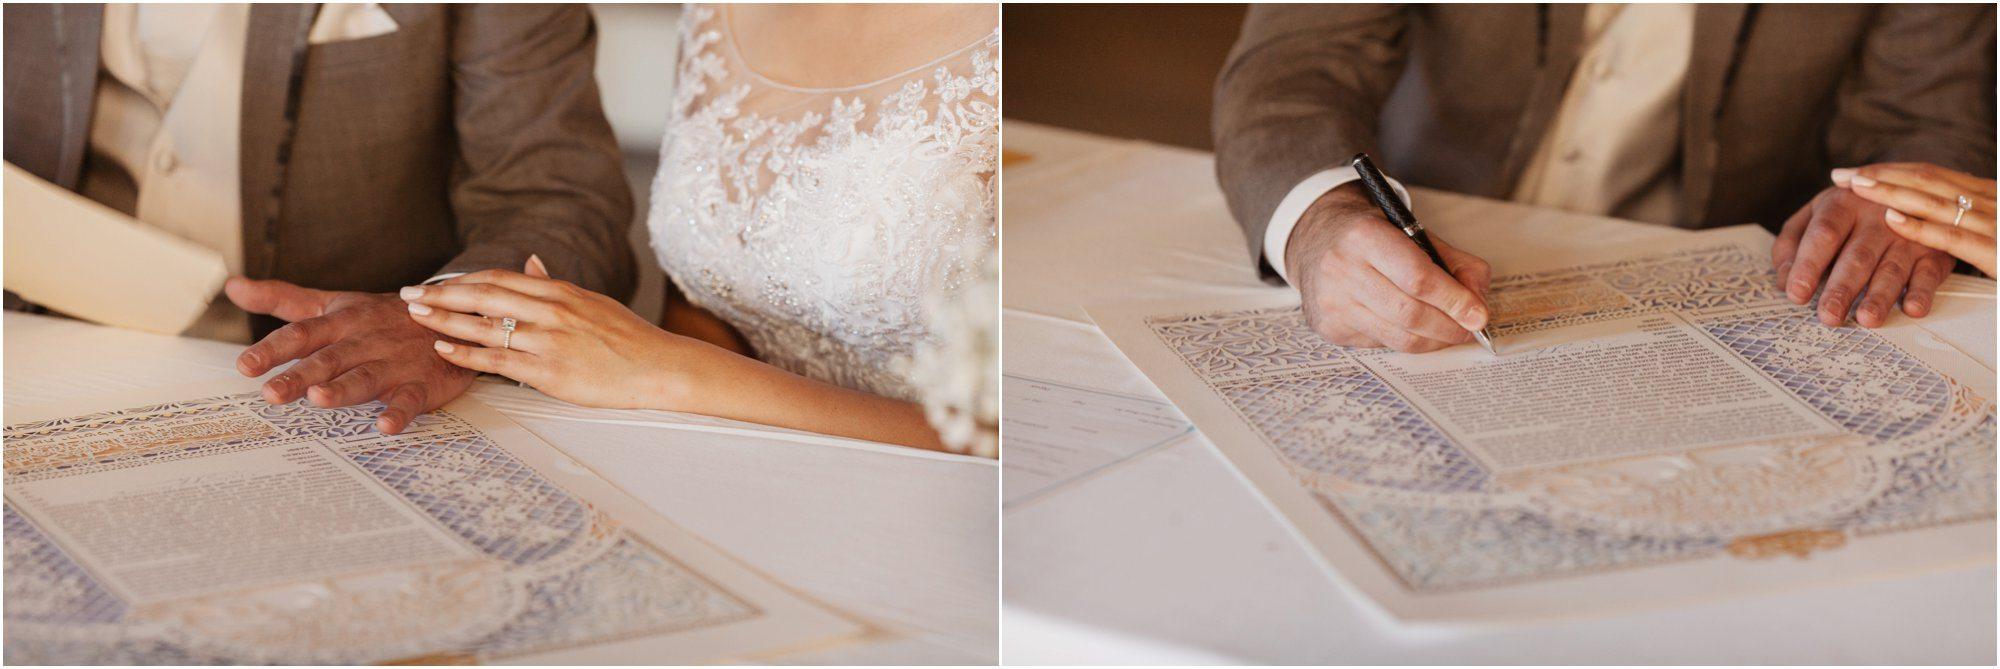 0018albuquerque-wedding-photographer-blue-rose-photography-studio